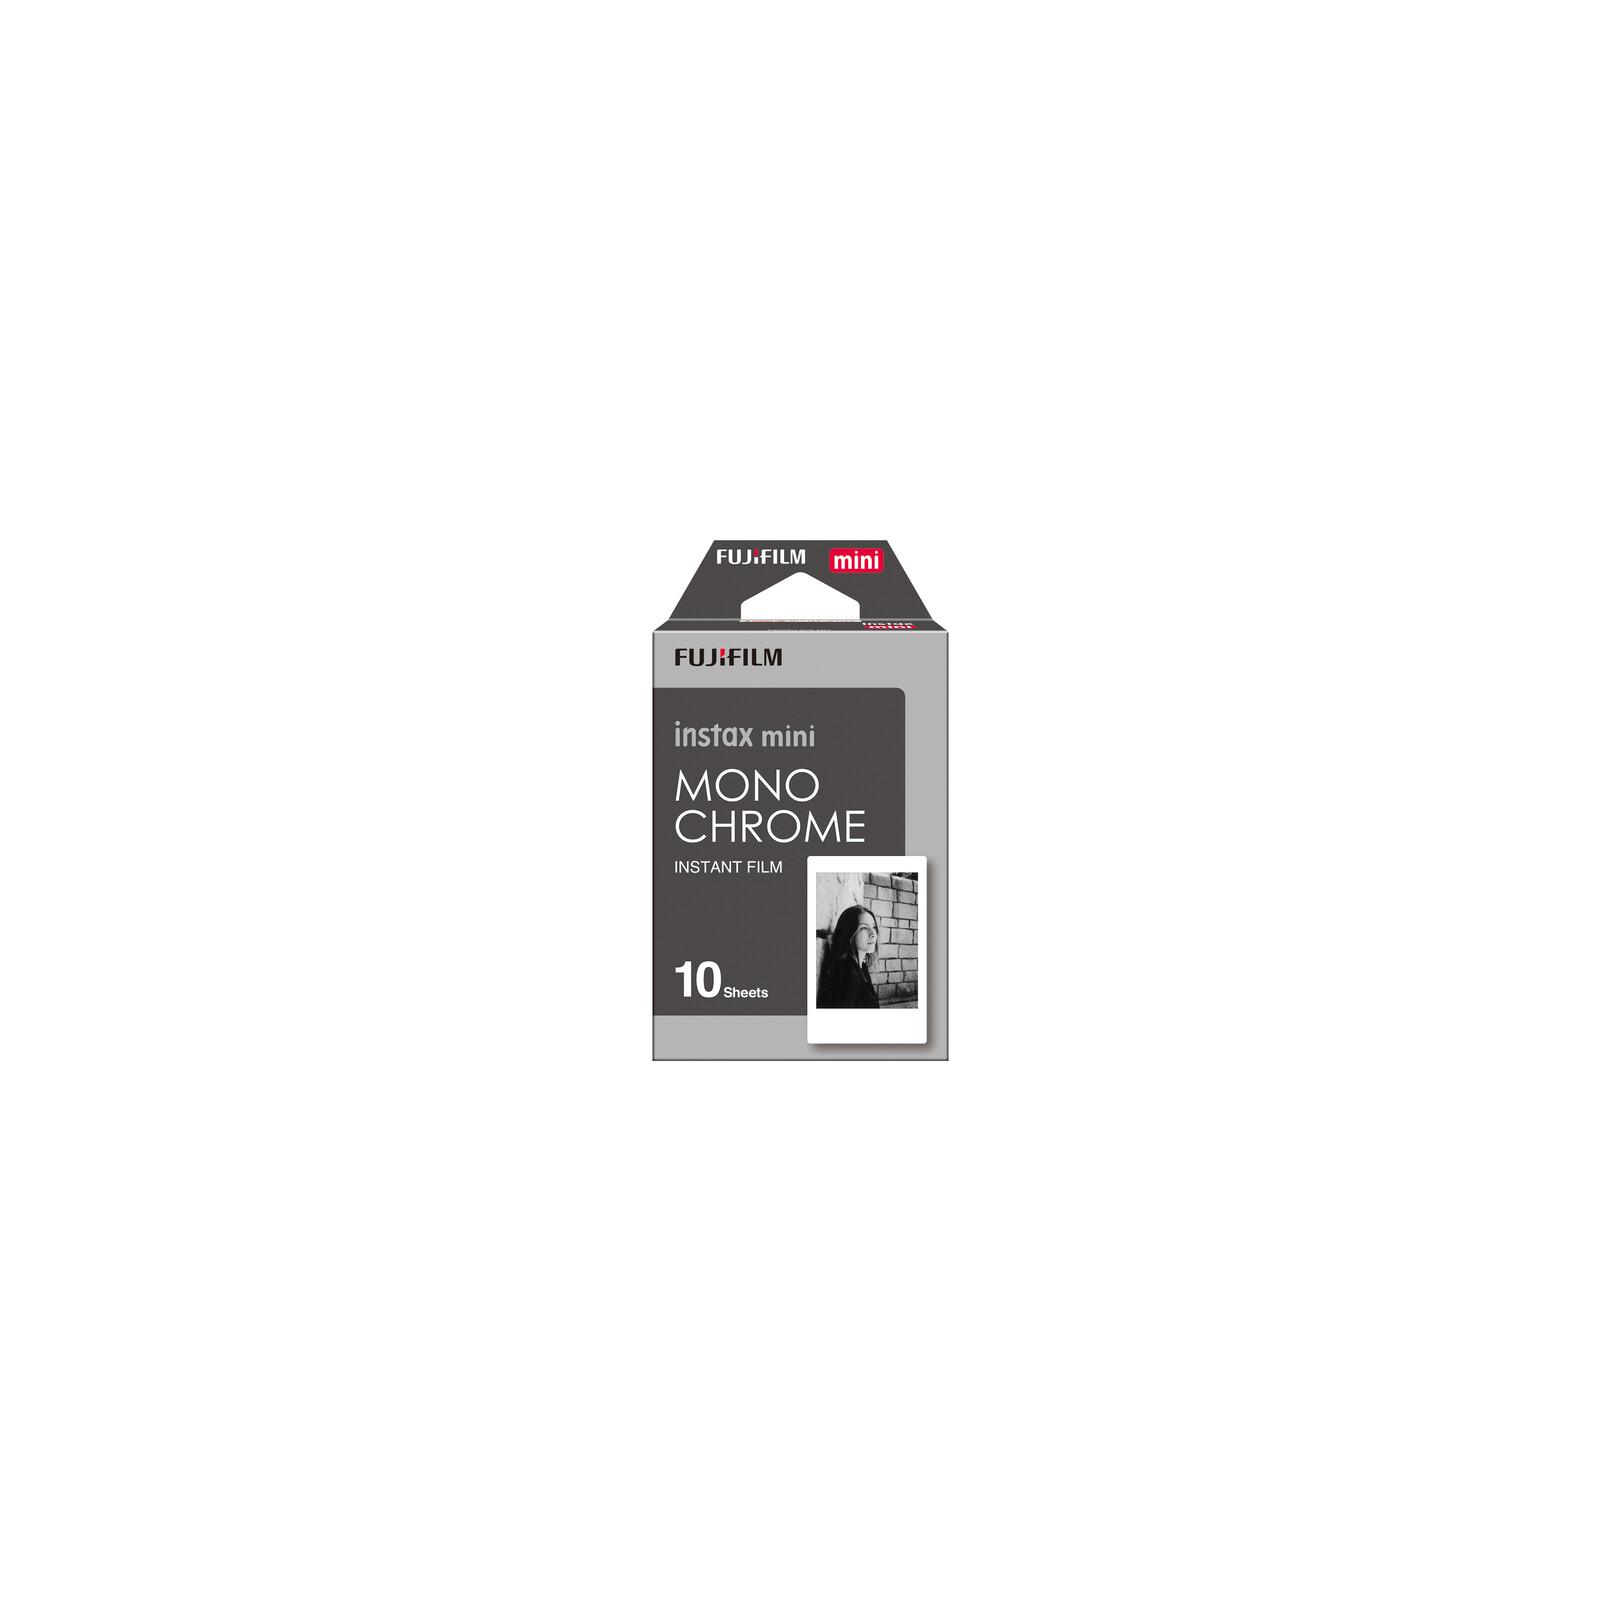 Fujifilm Instax Mini Monochrome s/w + Aufbewahrungsbox